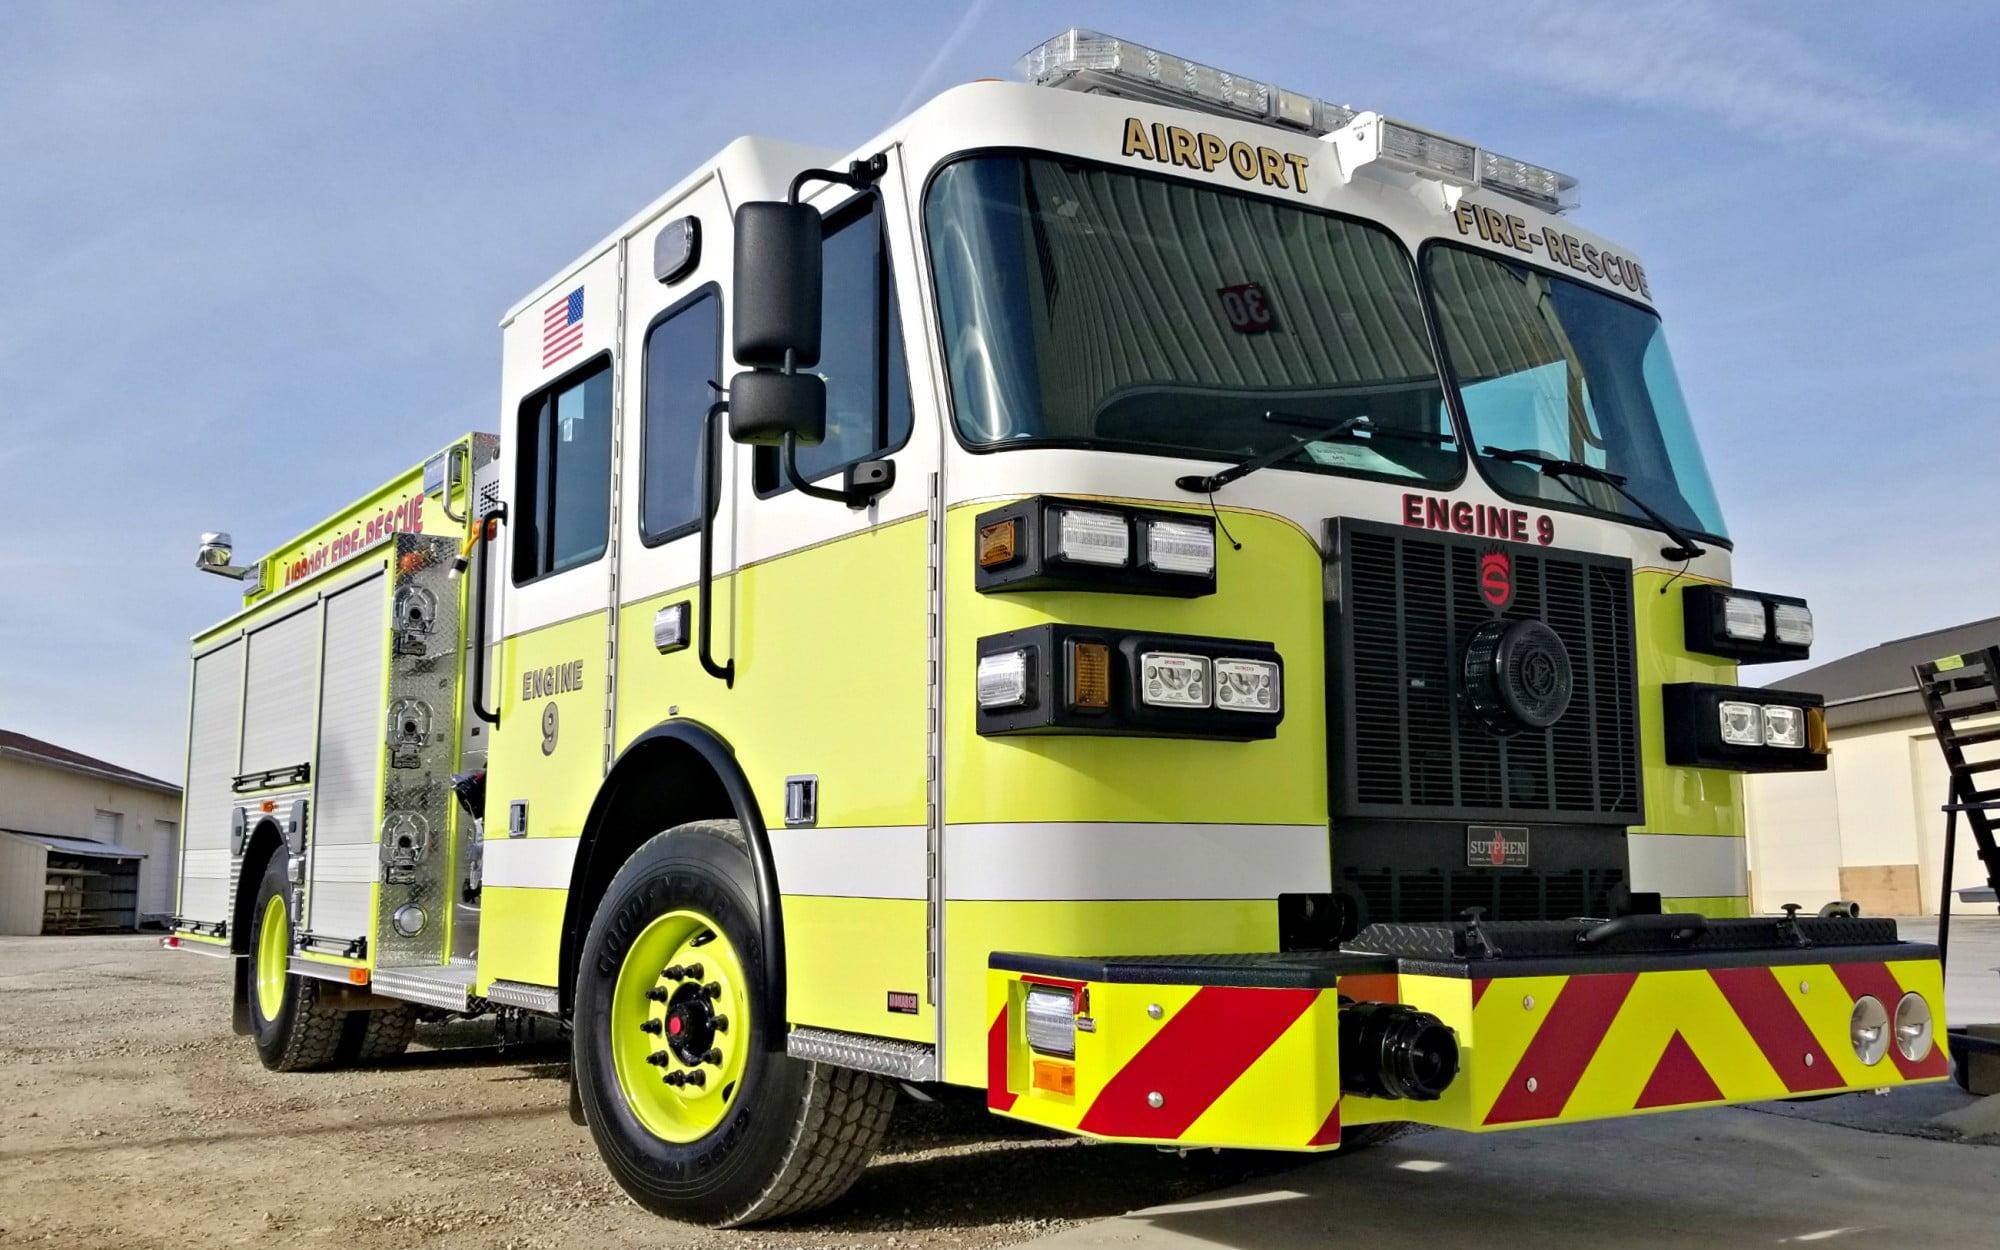 bradley-airport-fire-department